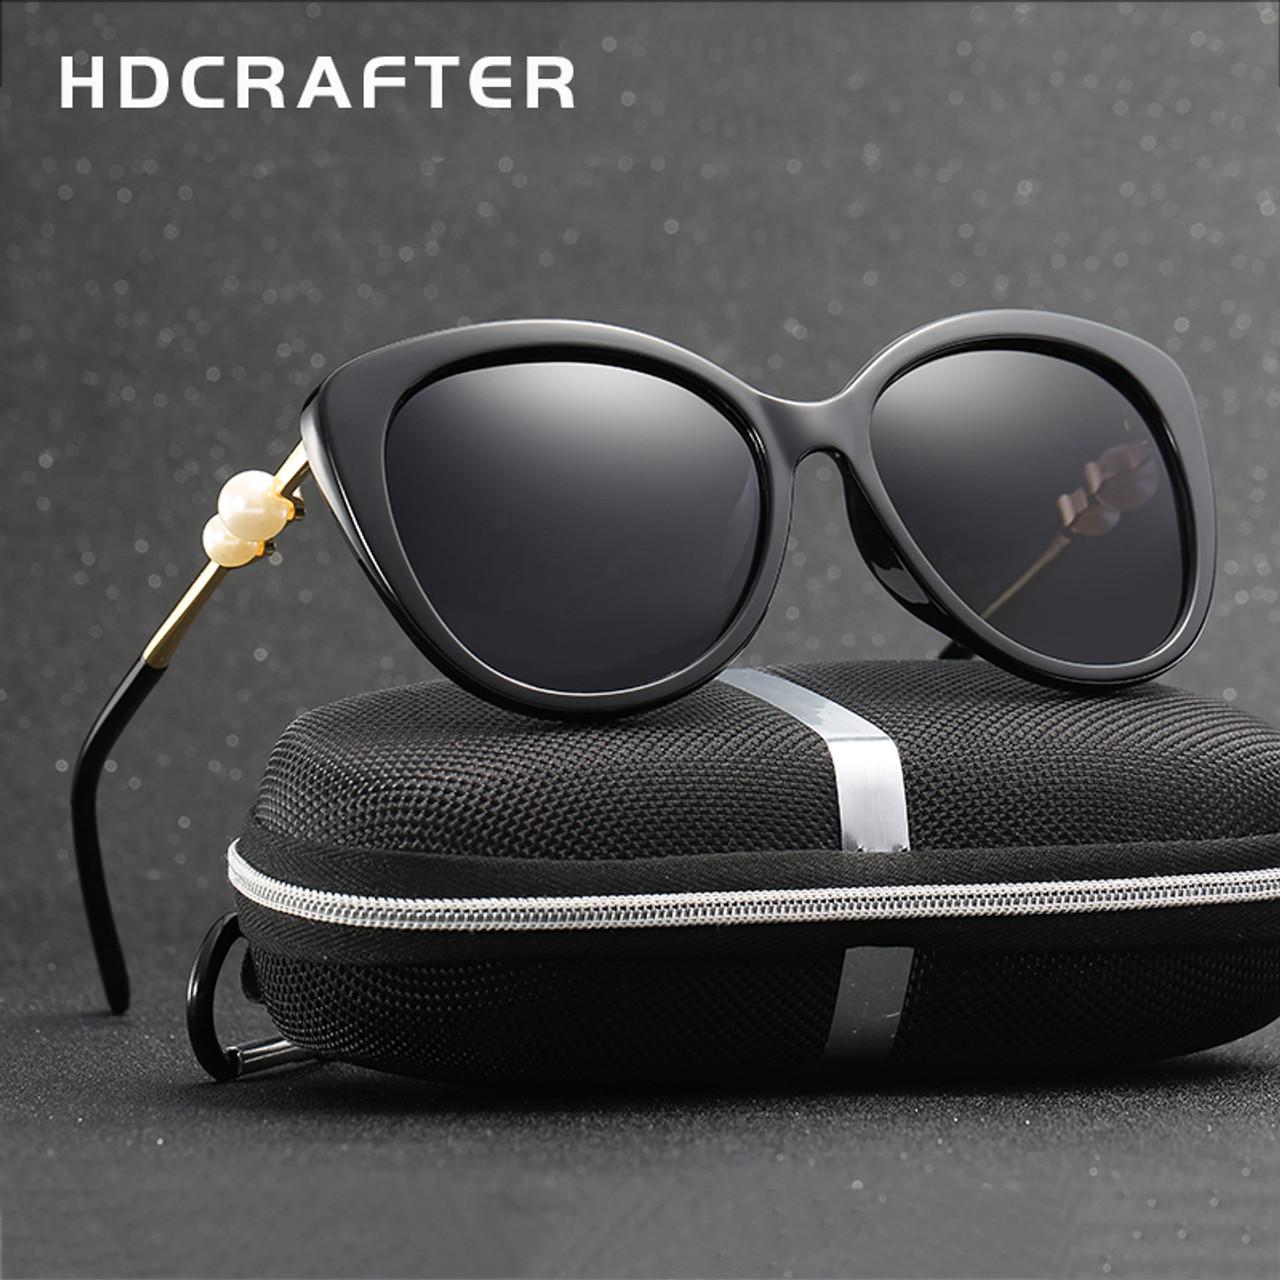 b7eea83ec82 2017 HDCRAFTER Fashion Pearl Polarized Sunglasses Women Luxury Lady Brand  Designer Sun Glasses Vintage Elegant Eyewear ...